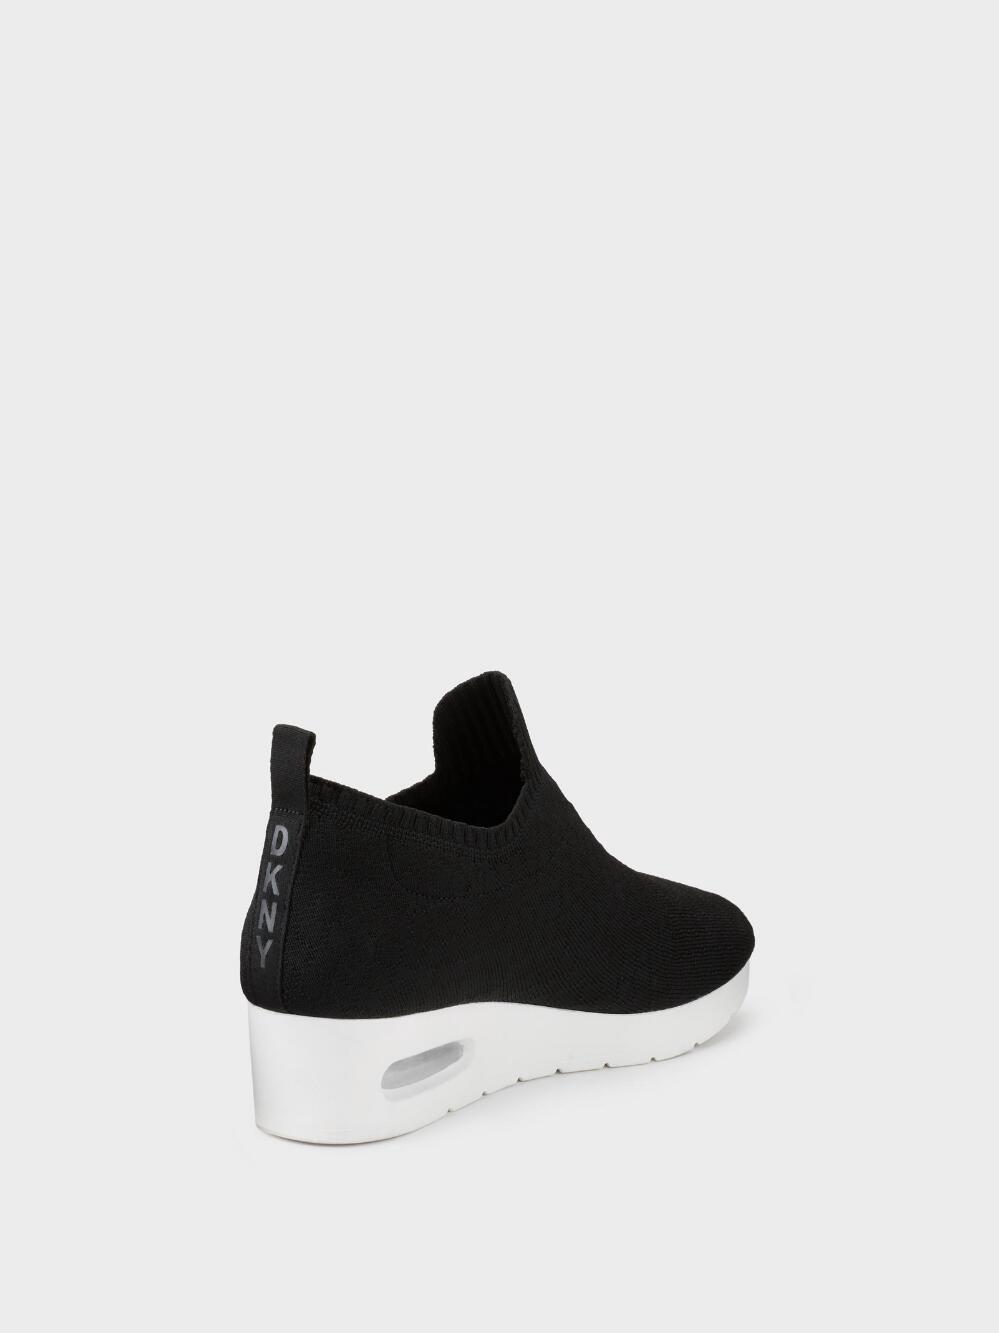 547834b31fa Dkny Angie Slip On Low Wedge Sneaker - Black 7.5